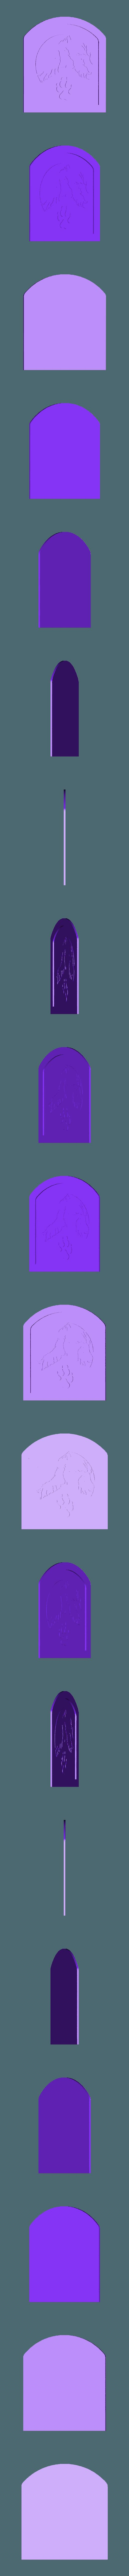 Loups_Hurlants.stl Télécharger fichier STL gratuit Loups hurlants - Loups hurlants • Design pour imprimante 3D, yb__magiic